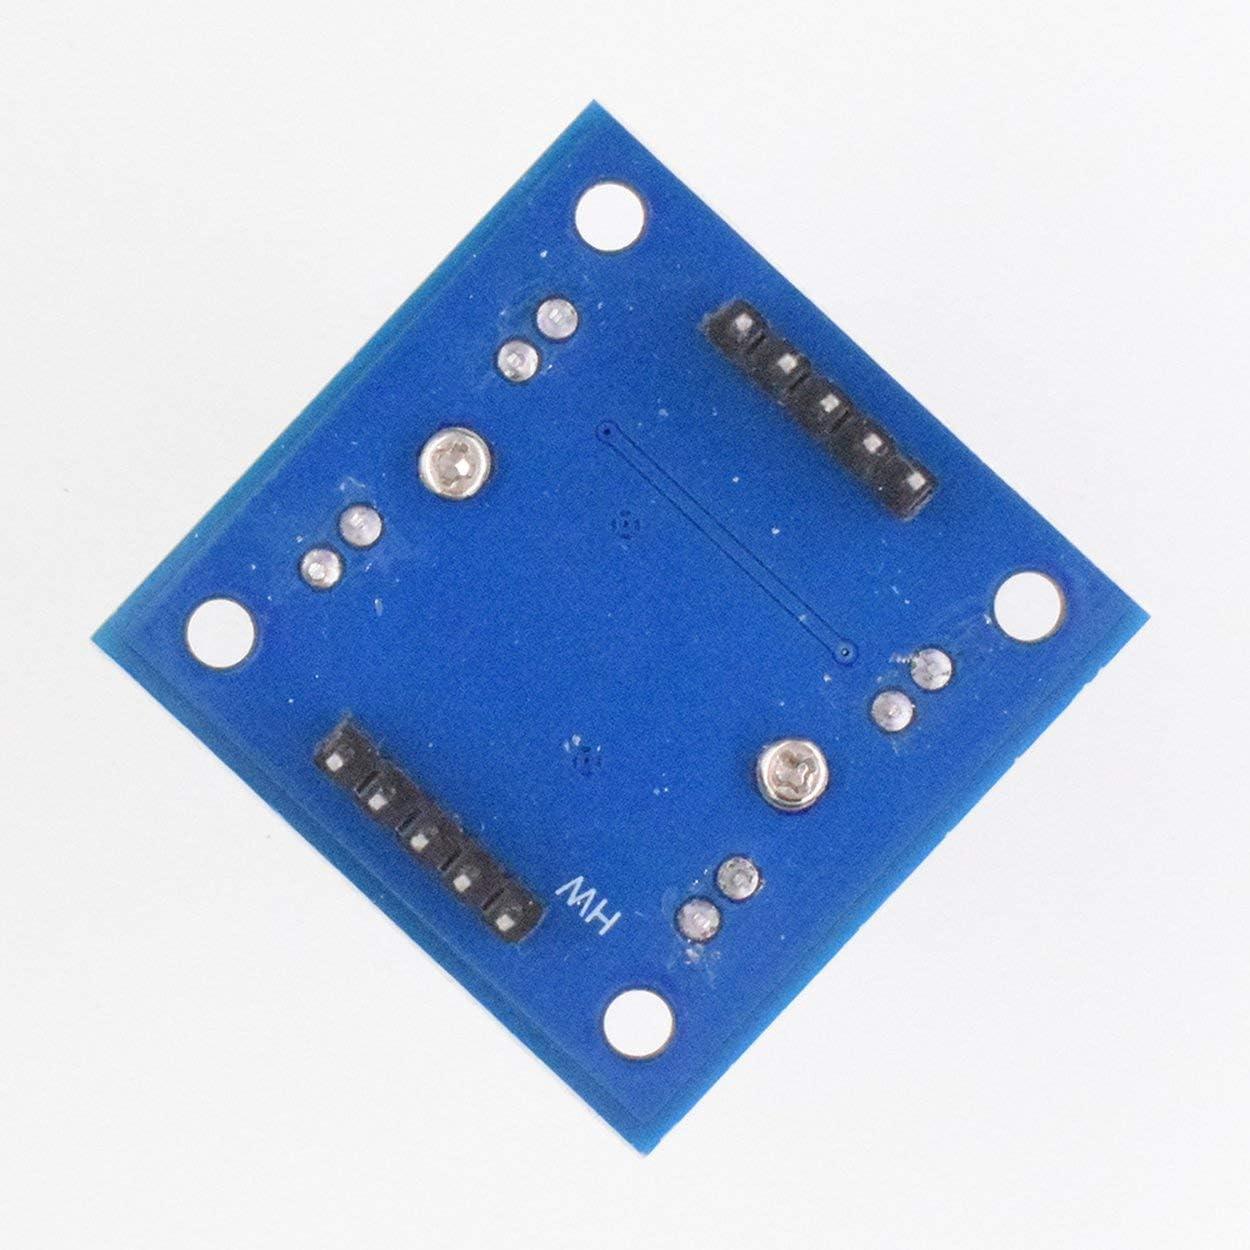 GY-31 TCS230 TCS3200 Farbsensor Farbidentifikationsmodul Farbsensormodul F/ür Arduino DIY Modul